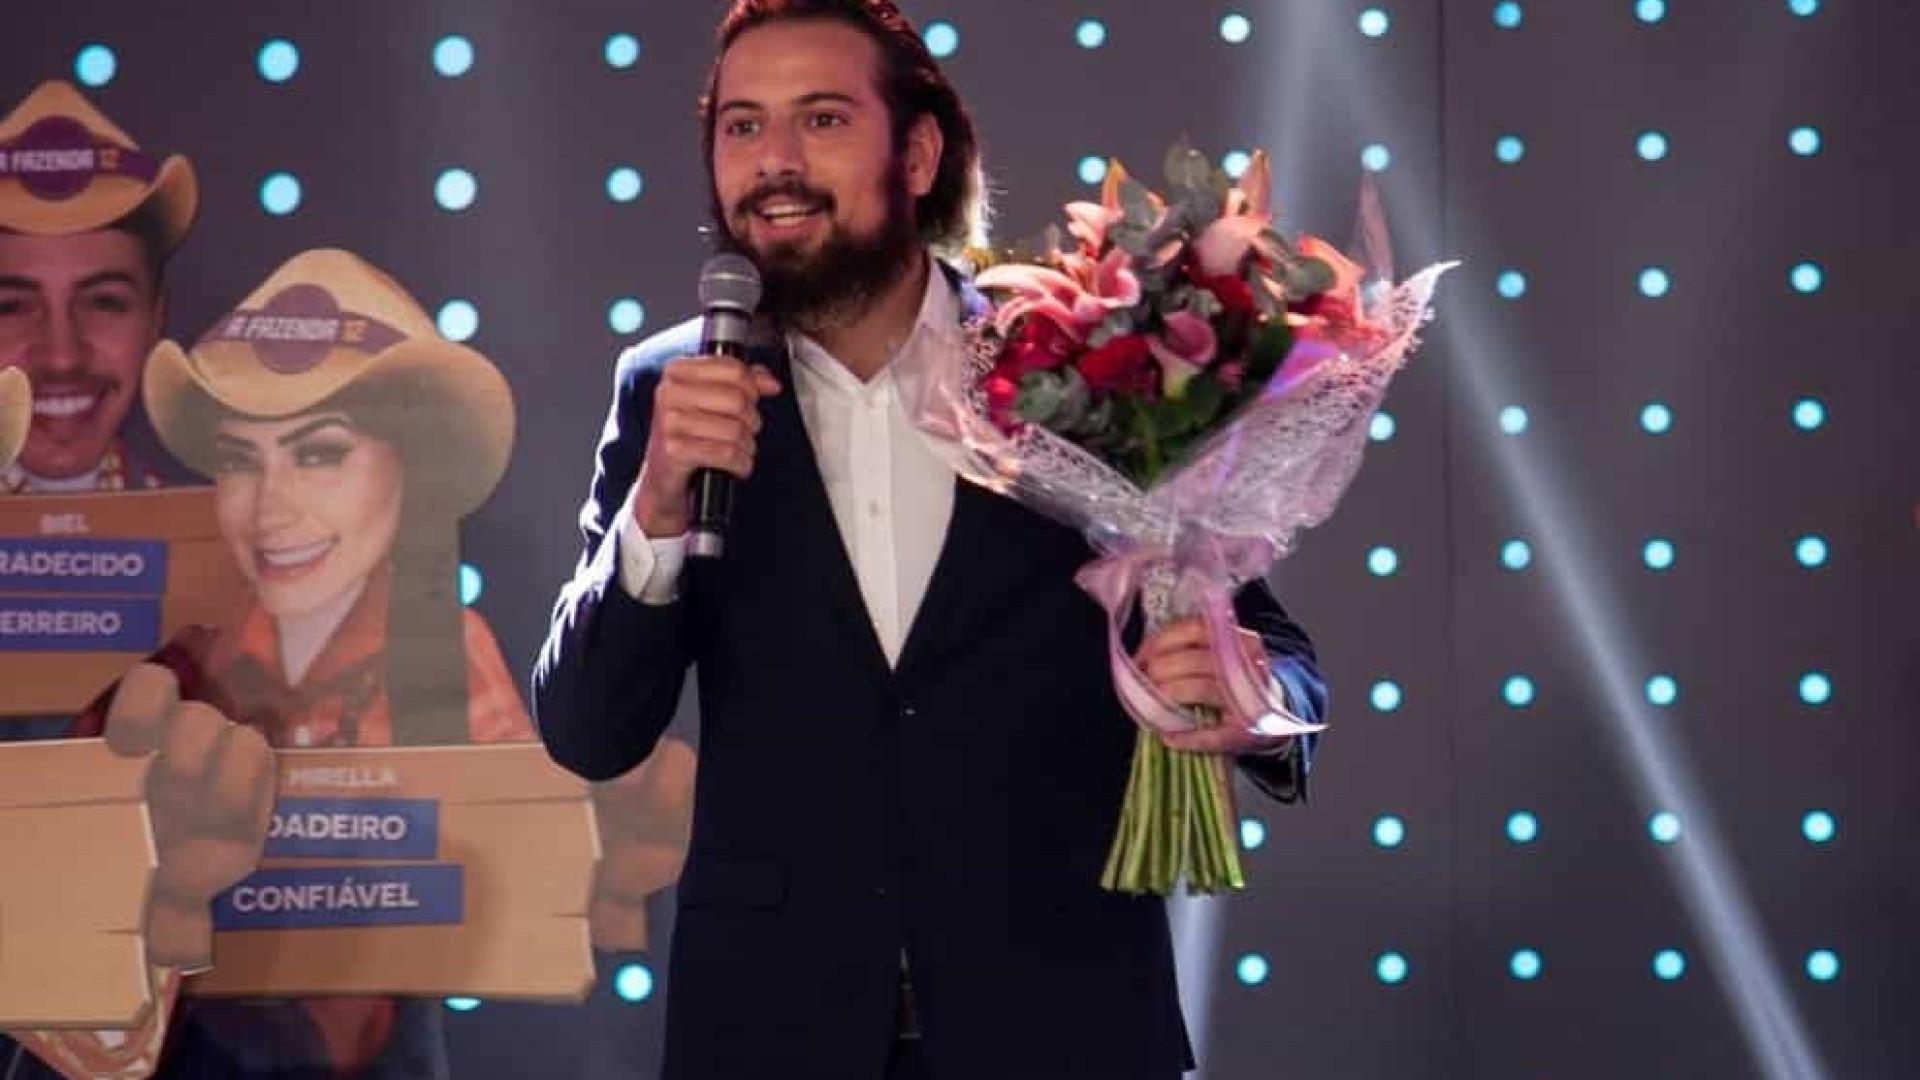 Cartolouco pede Luiza Ambiel em namoro no palco do programa Hora do Faro